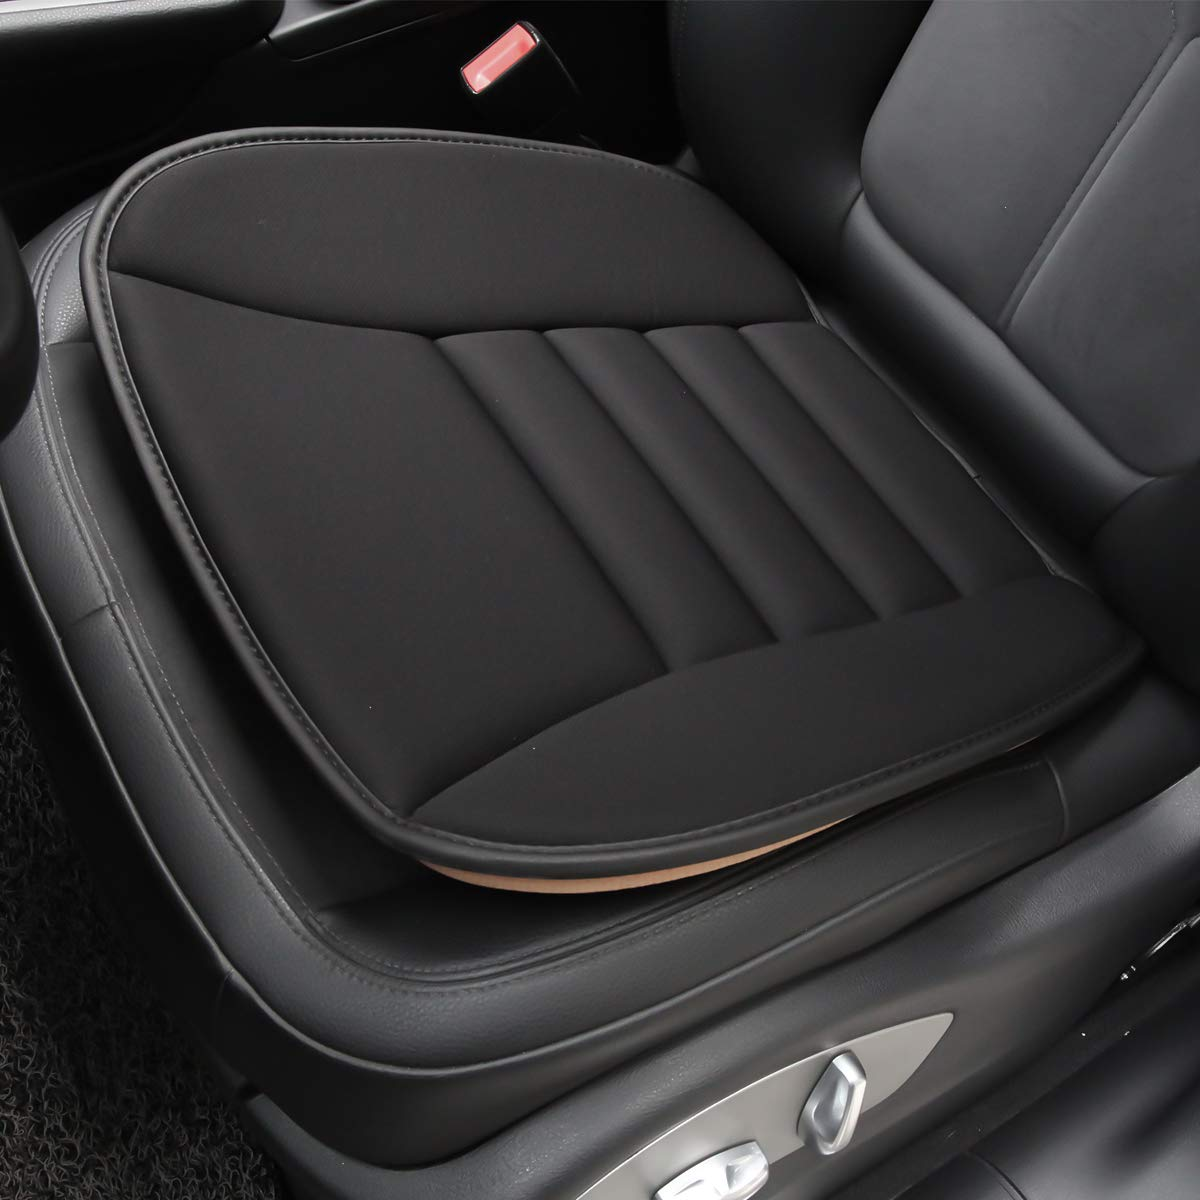 Aukee Car Seat Cushion, Office Chair Wheelchair Mat Memory Foam Pad Back Sciatica Pain Relief